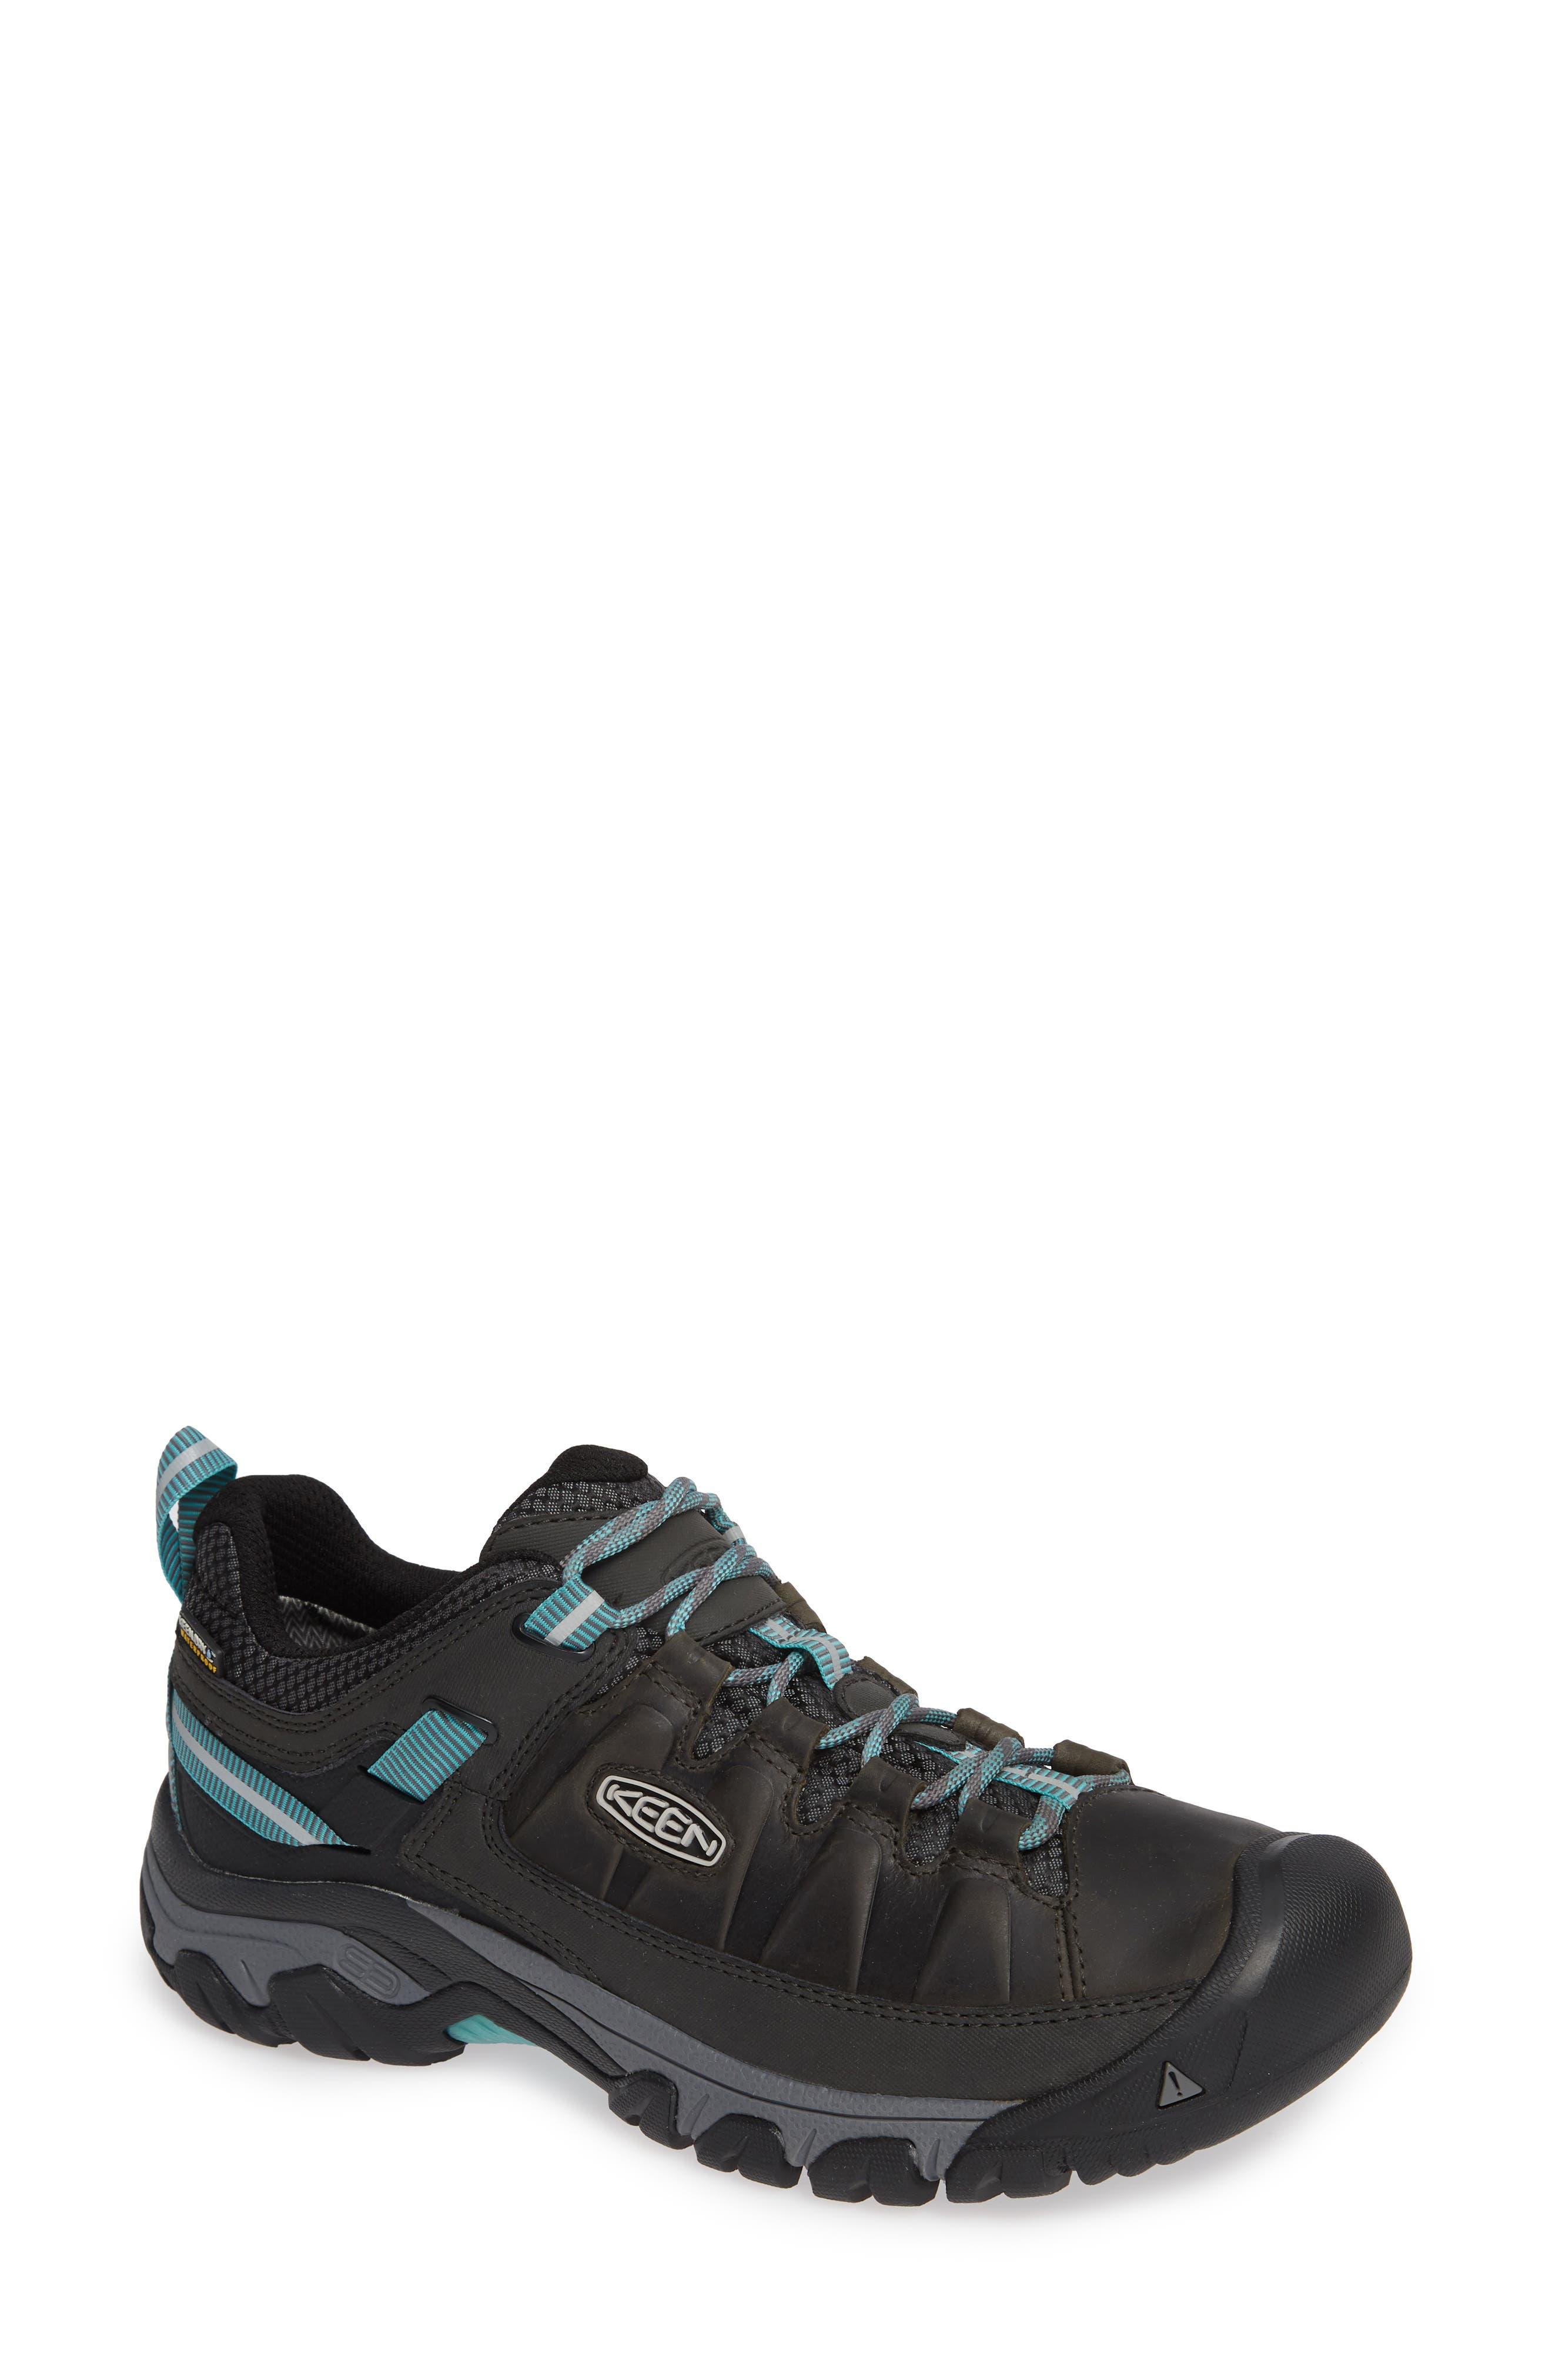 Targhee III Waterproof Hiking Shoe,                         Main,                         color, ALCATRAZ/ TURQUOISE LEATHER